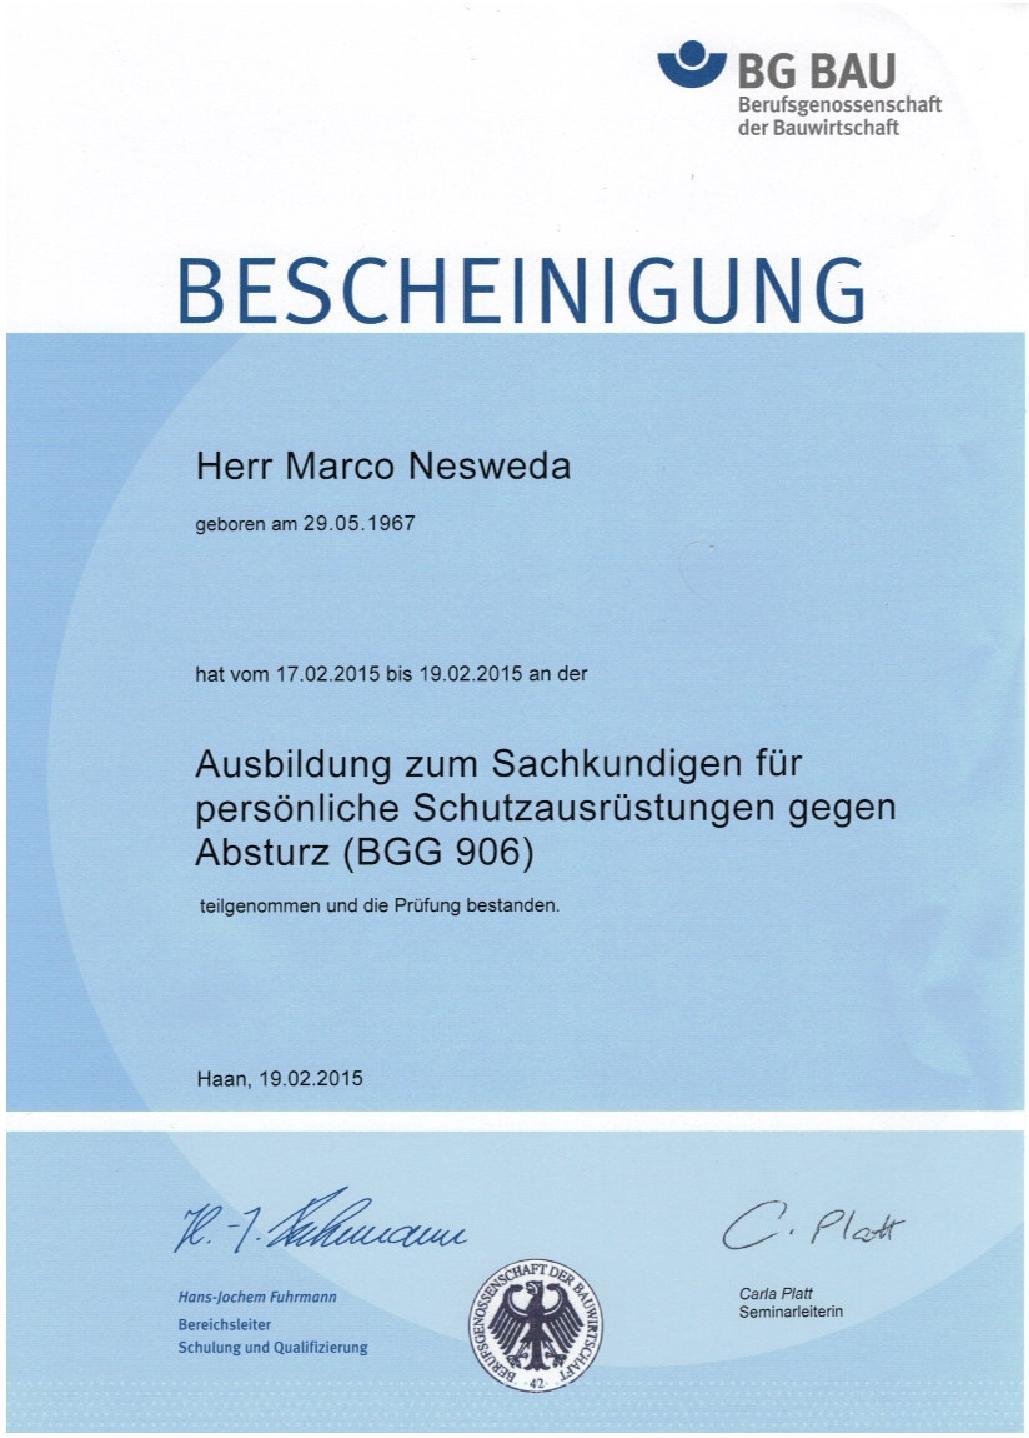 sachkundiger-fur-psa-ga-bgg-906-001.jpg